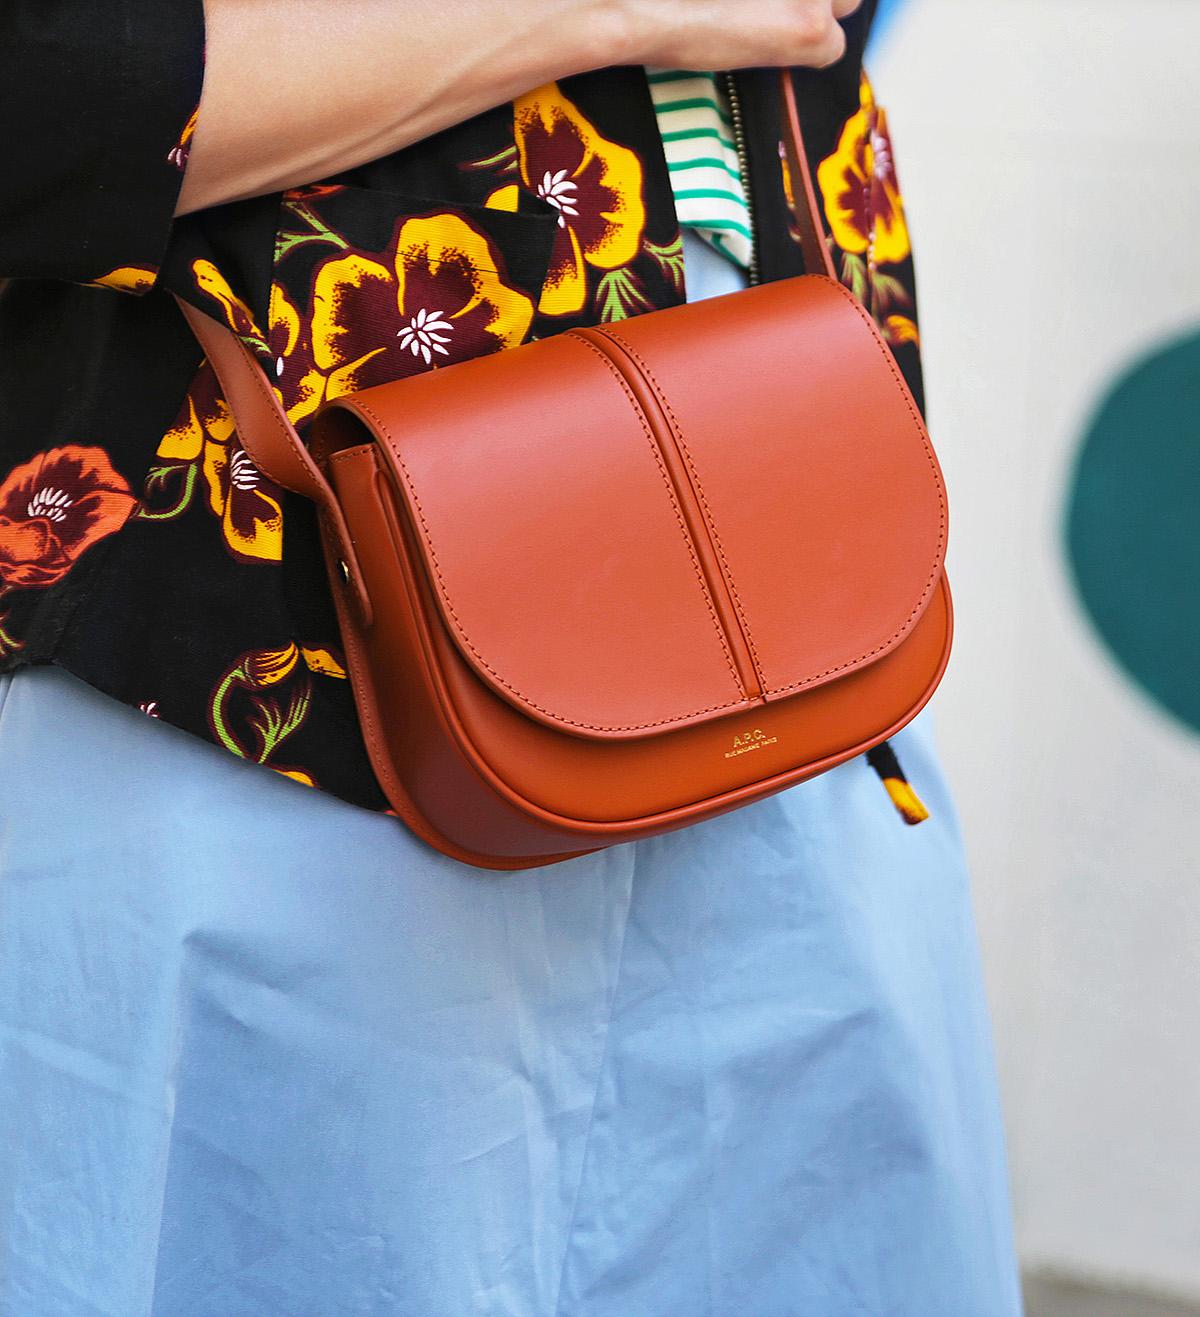 apc betty bag and santa cruz poppy jacket